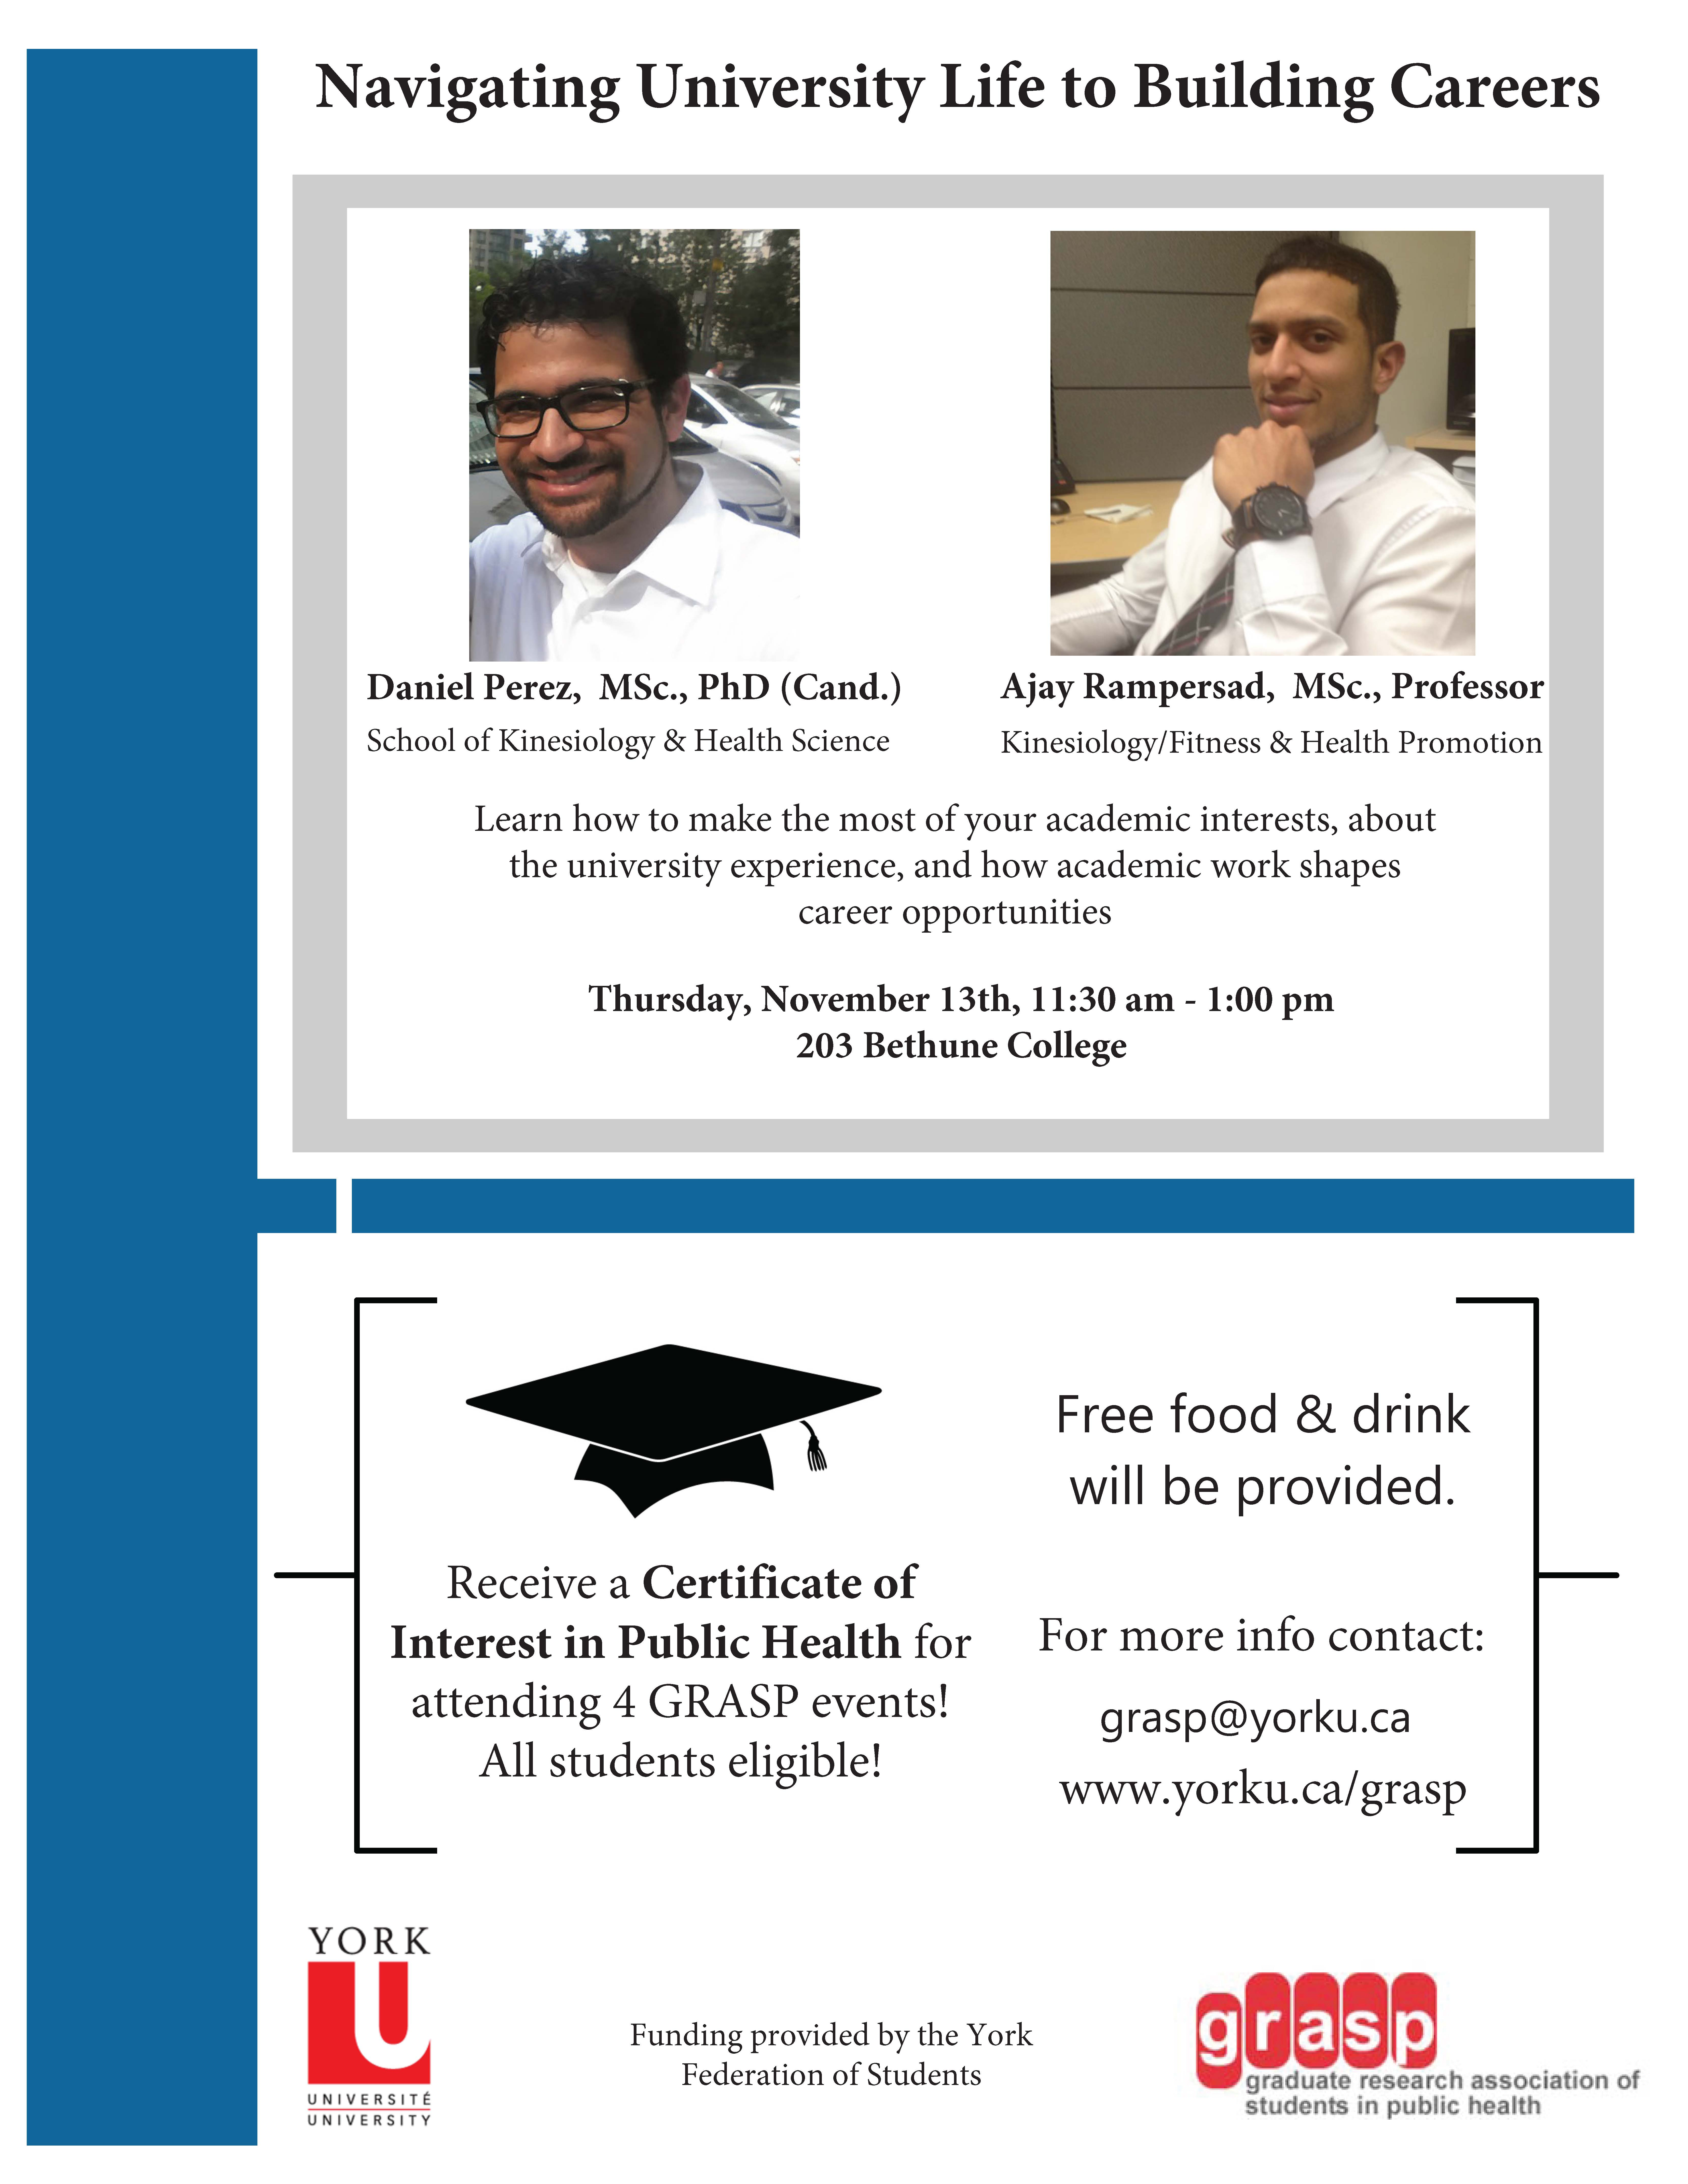 GRASP - University Life to Careers